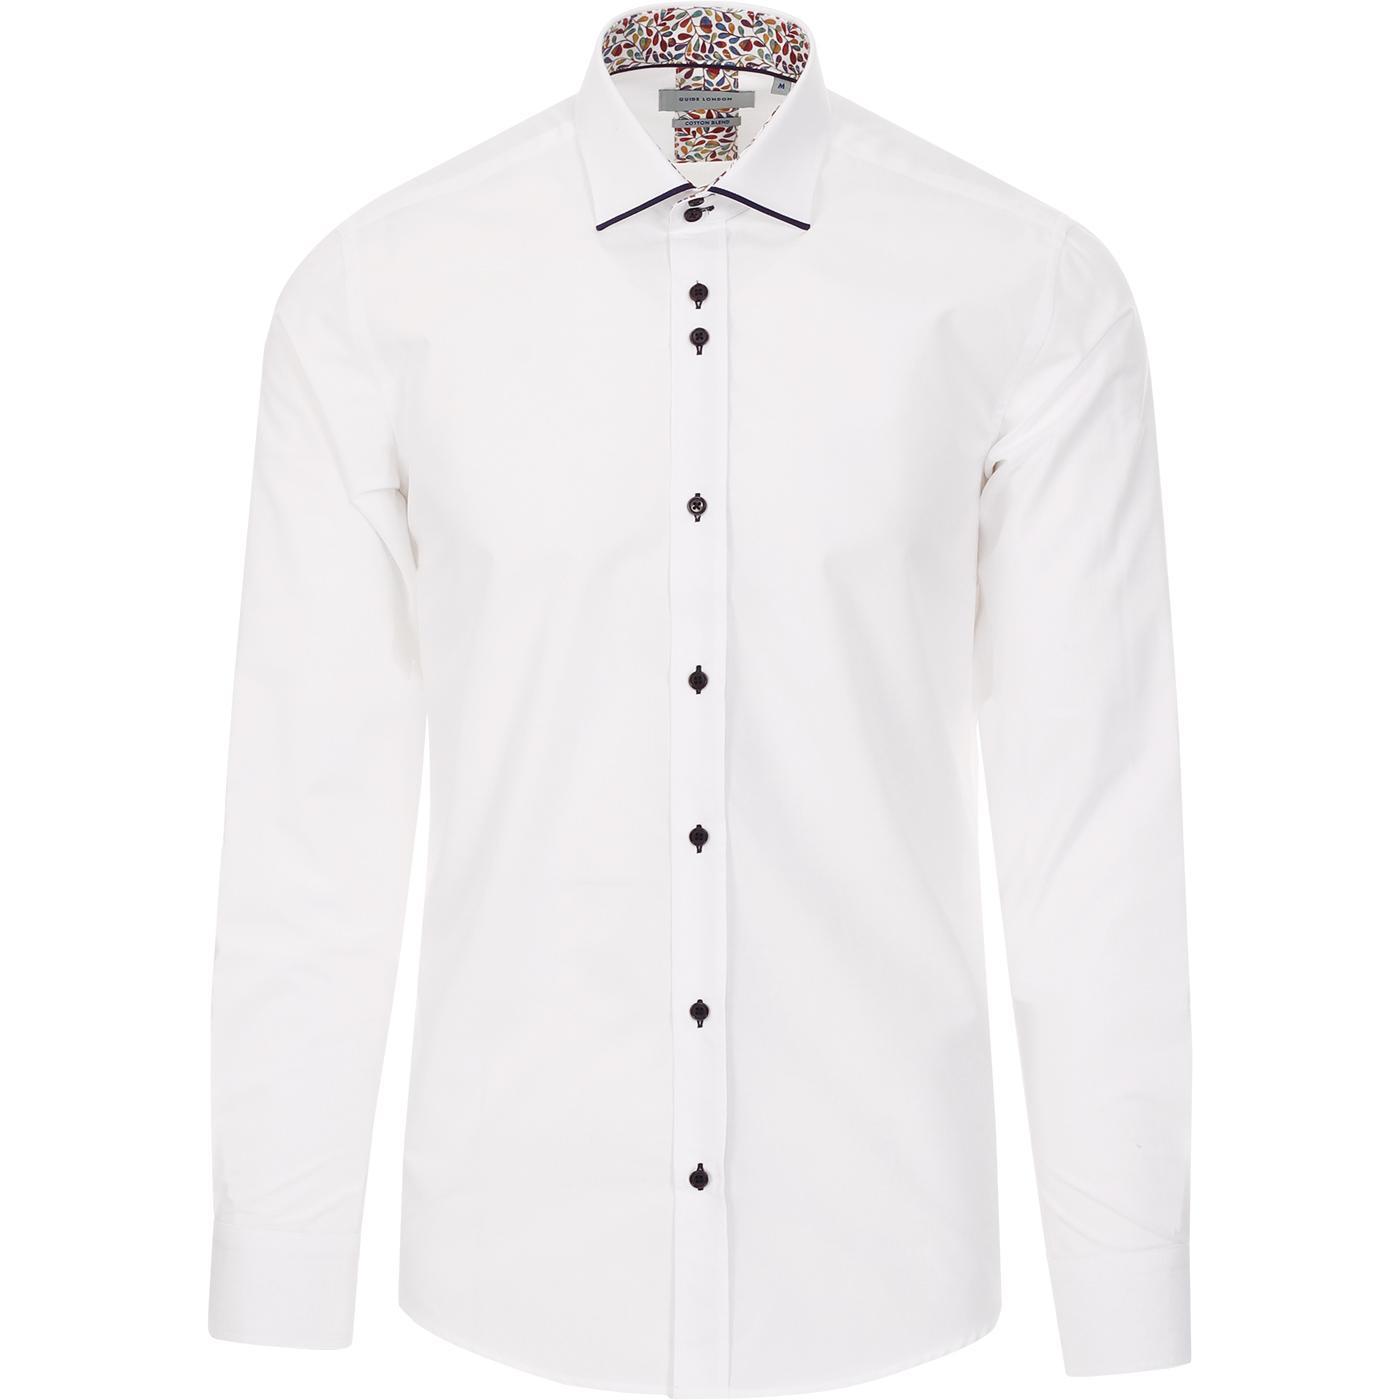 GUIDE LONDON 60s Mod Tipped Smart Shirt (White)